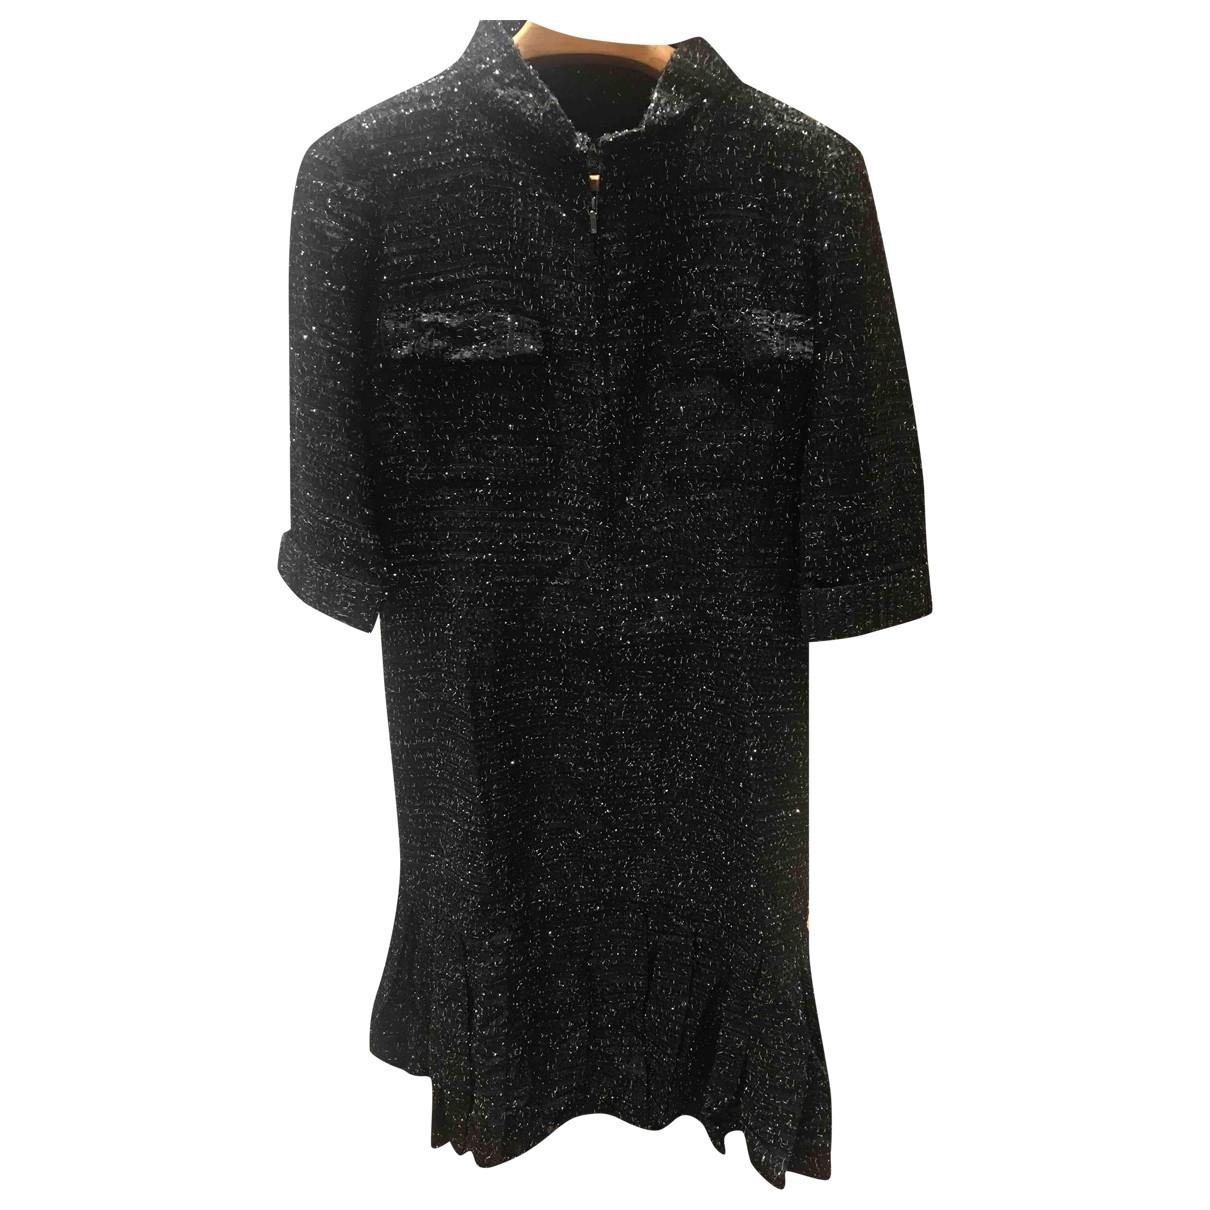 Chanel \N Black Tweed dress for Women 46 FR